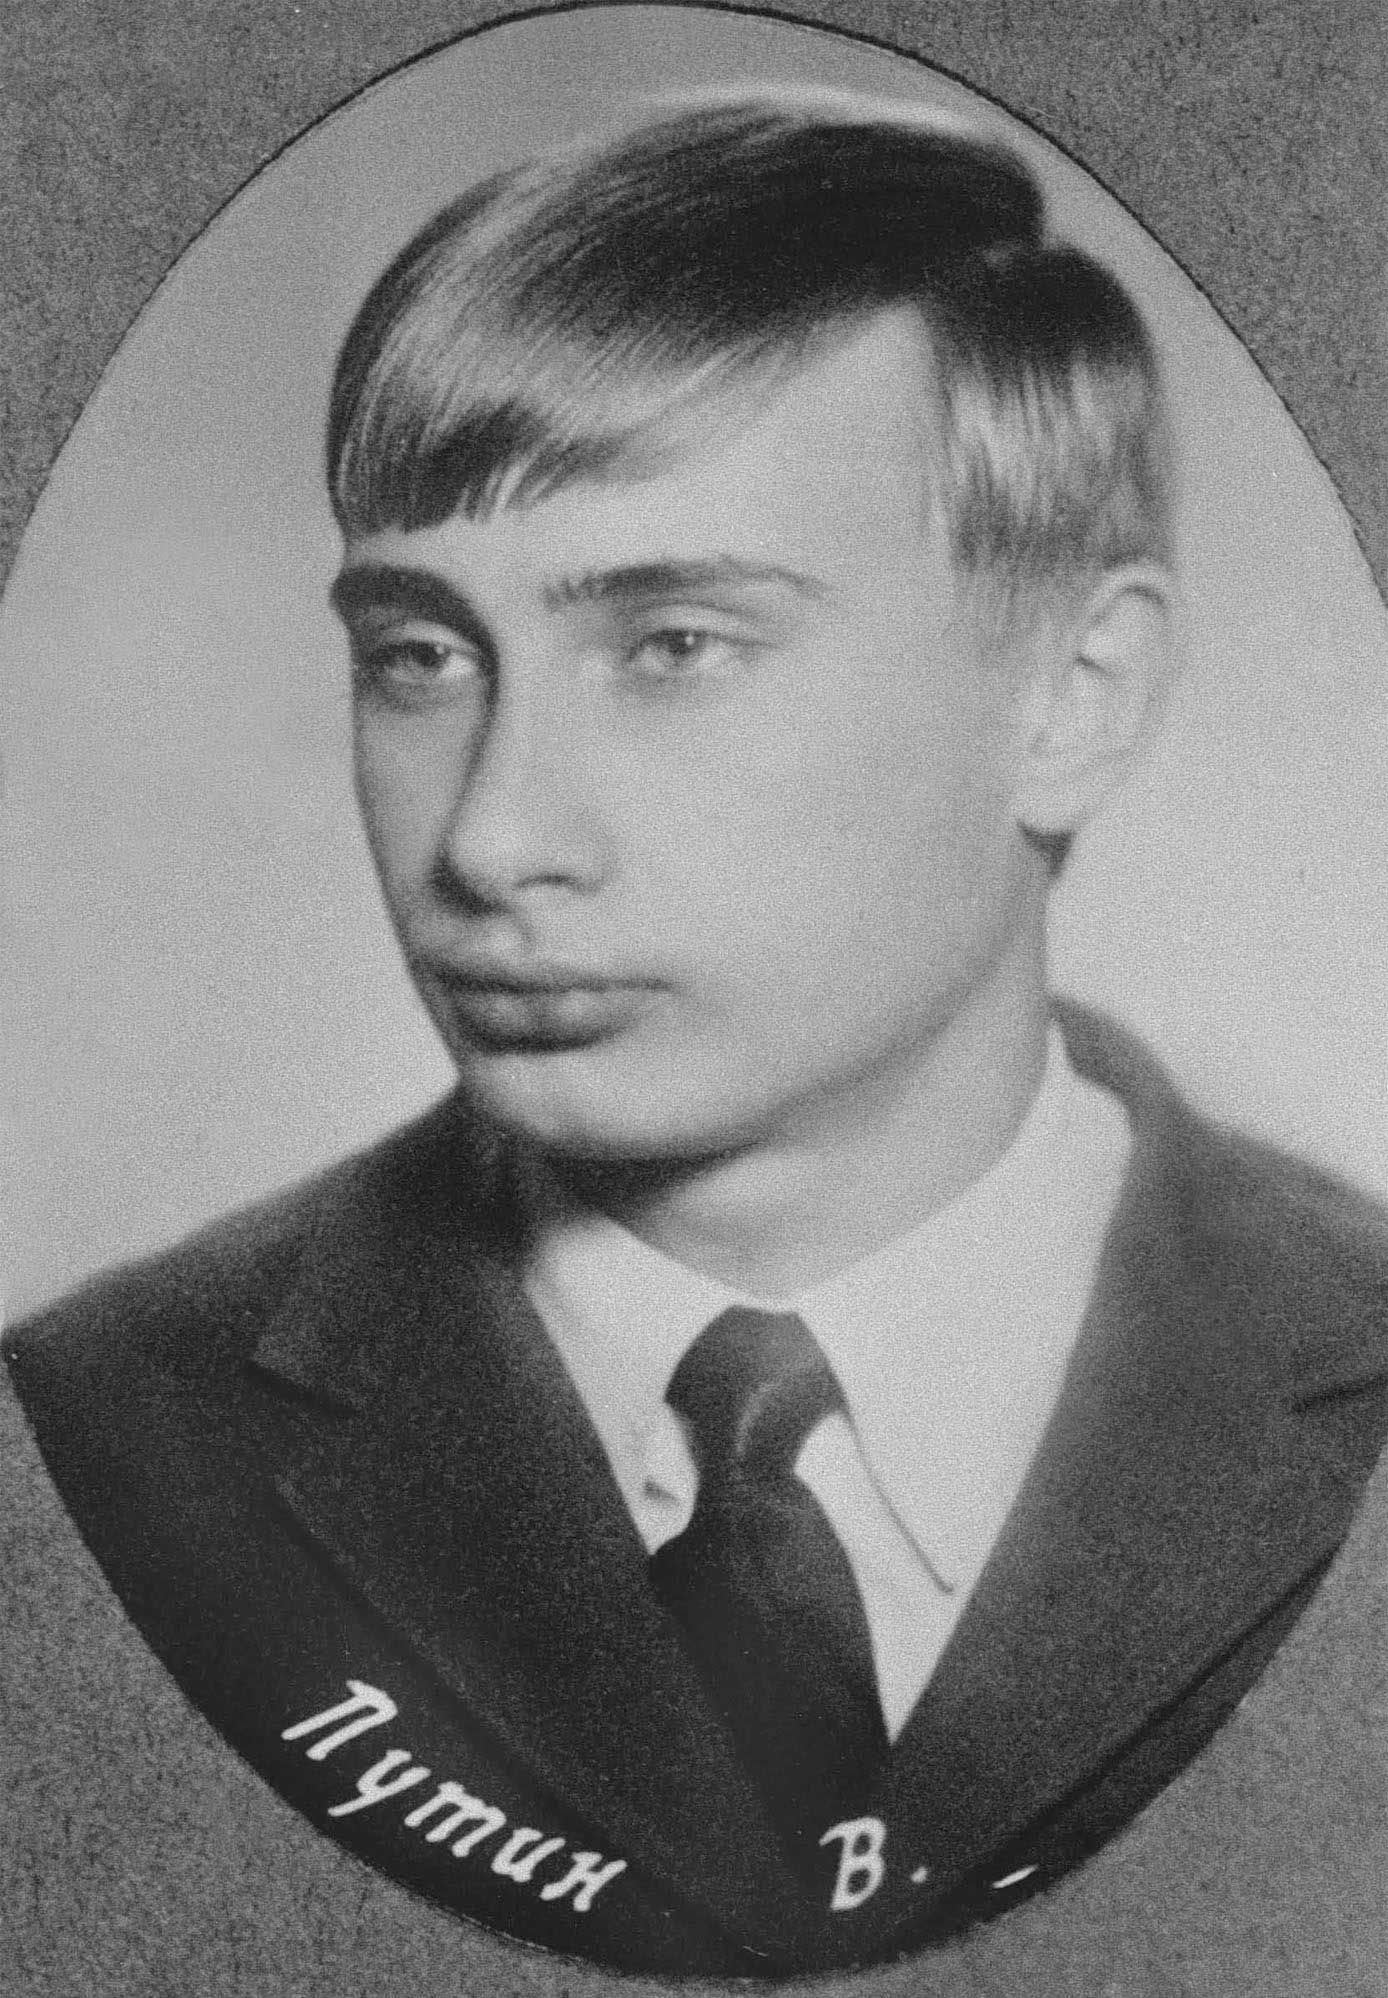 Vladimir Putin in 1970.